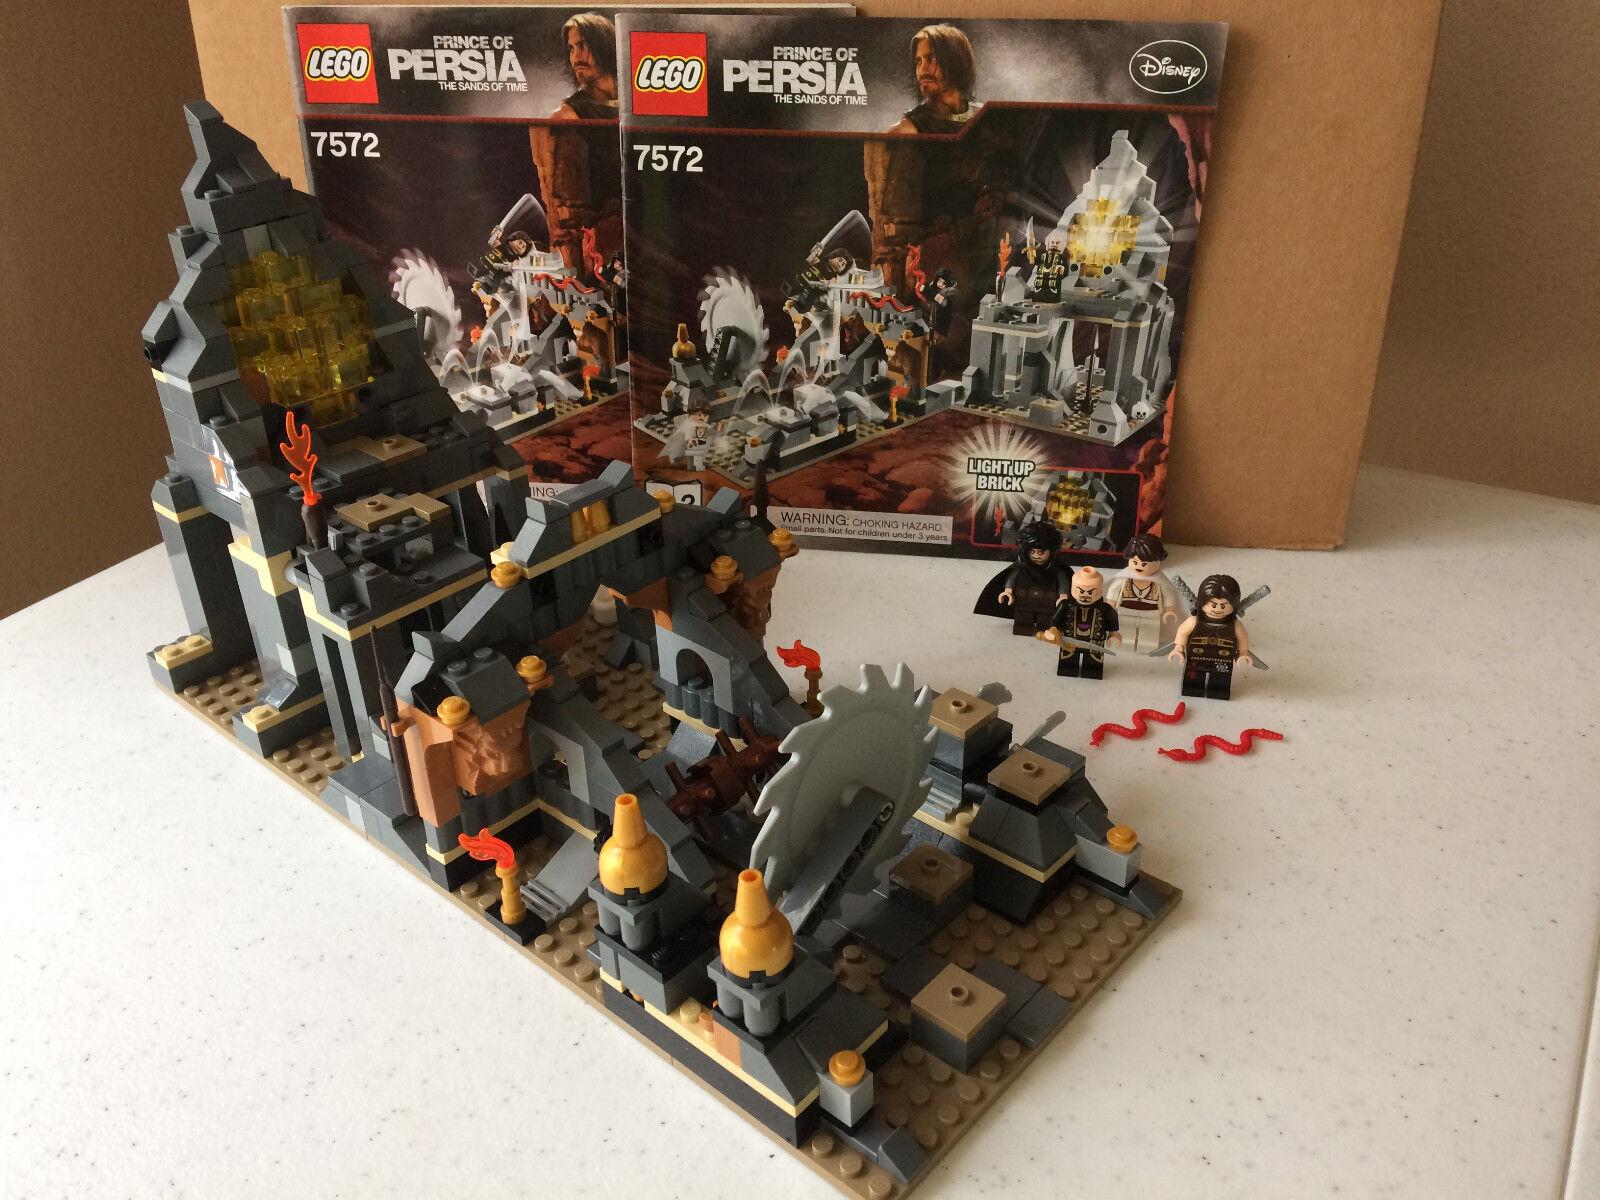 Lego 7572 Prince of Persia Quest Against Time Manual Minifigure 100% Set 501 pcs